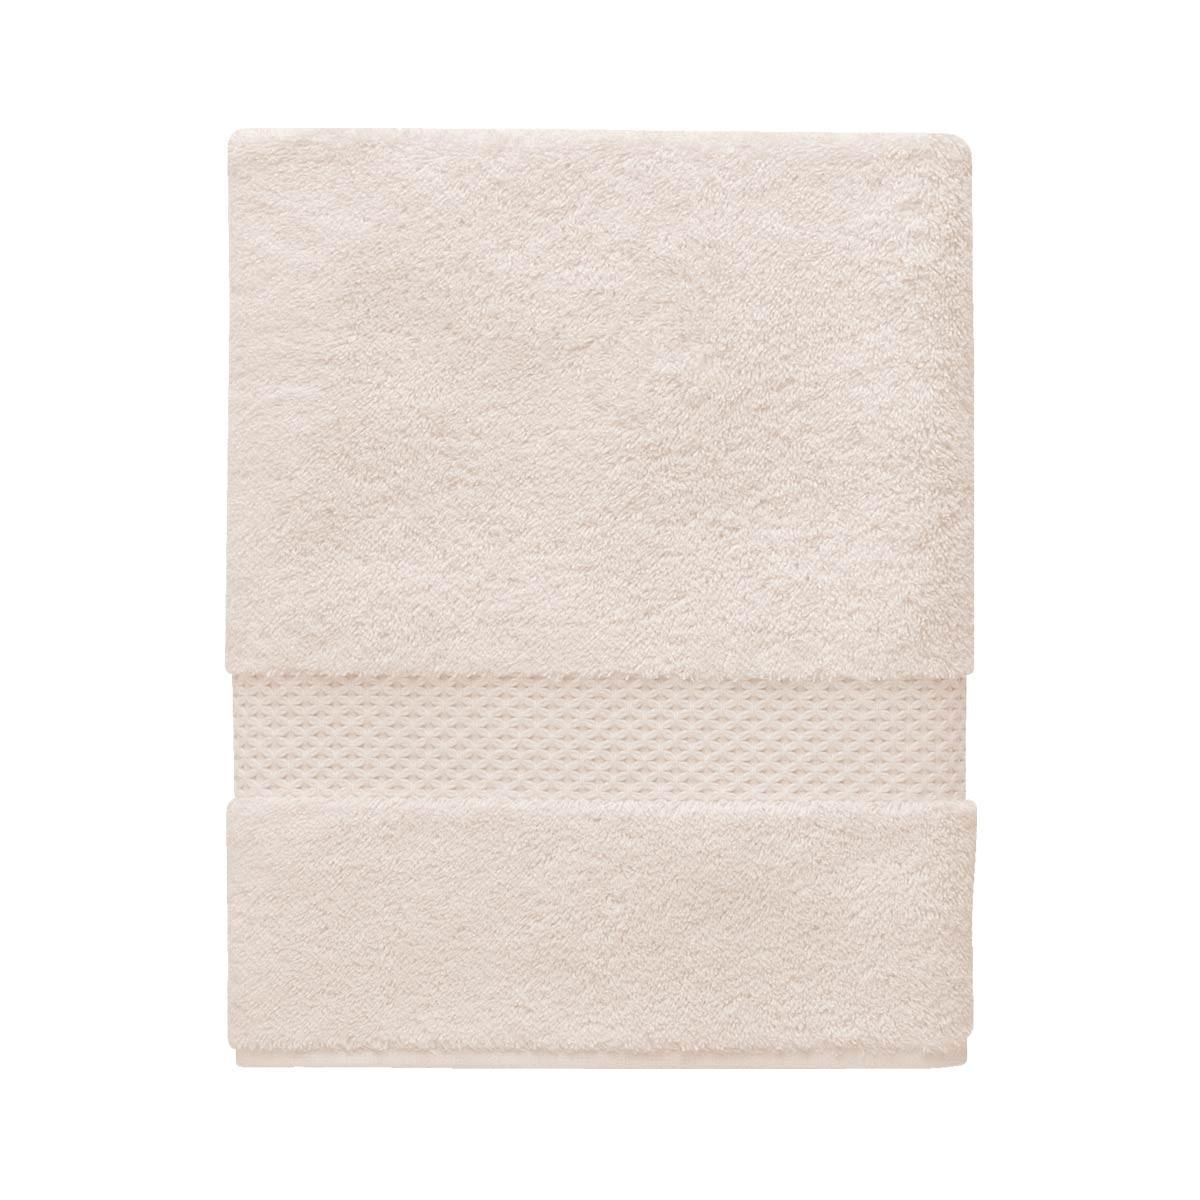 Etoile Nacre Bath Towel 70x140cm